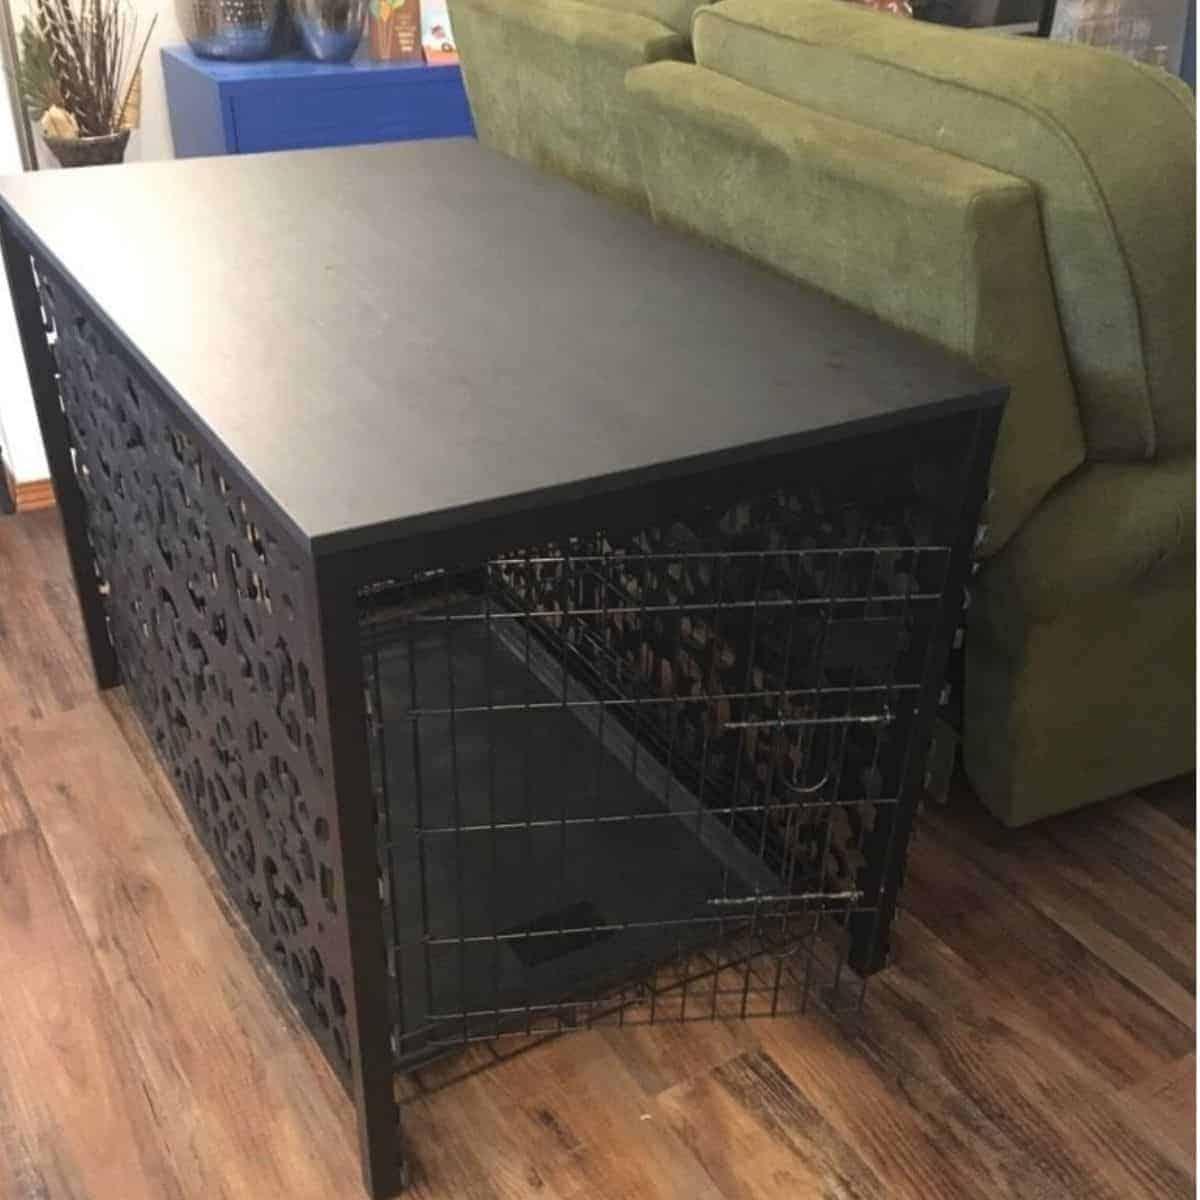 Ikea dog crate